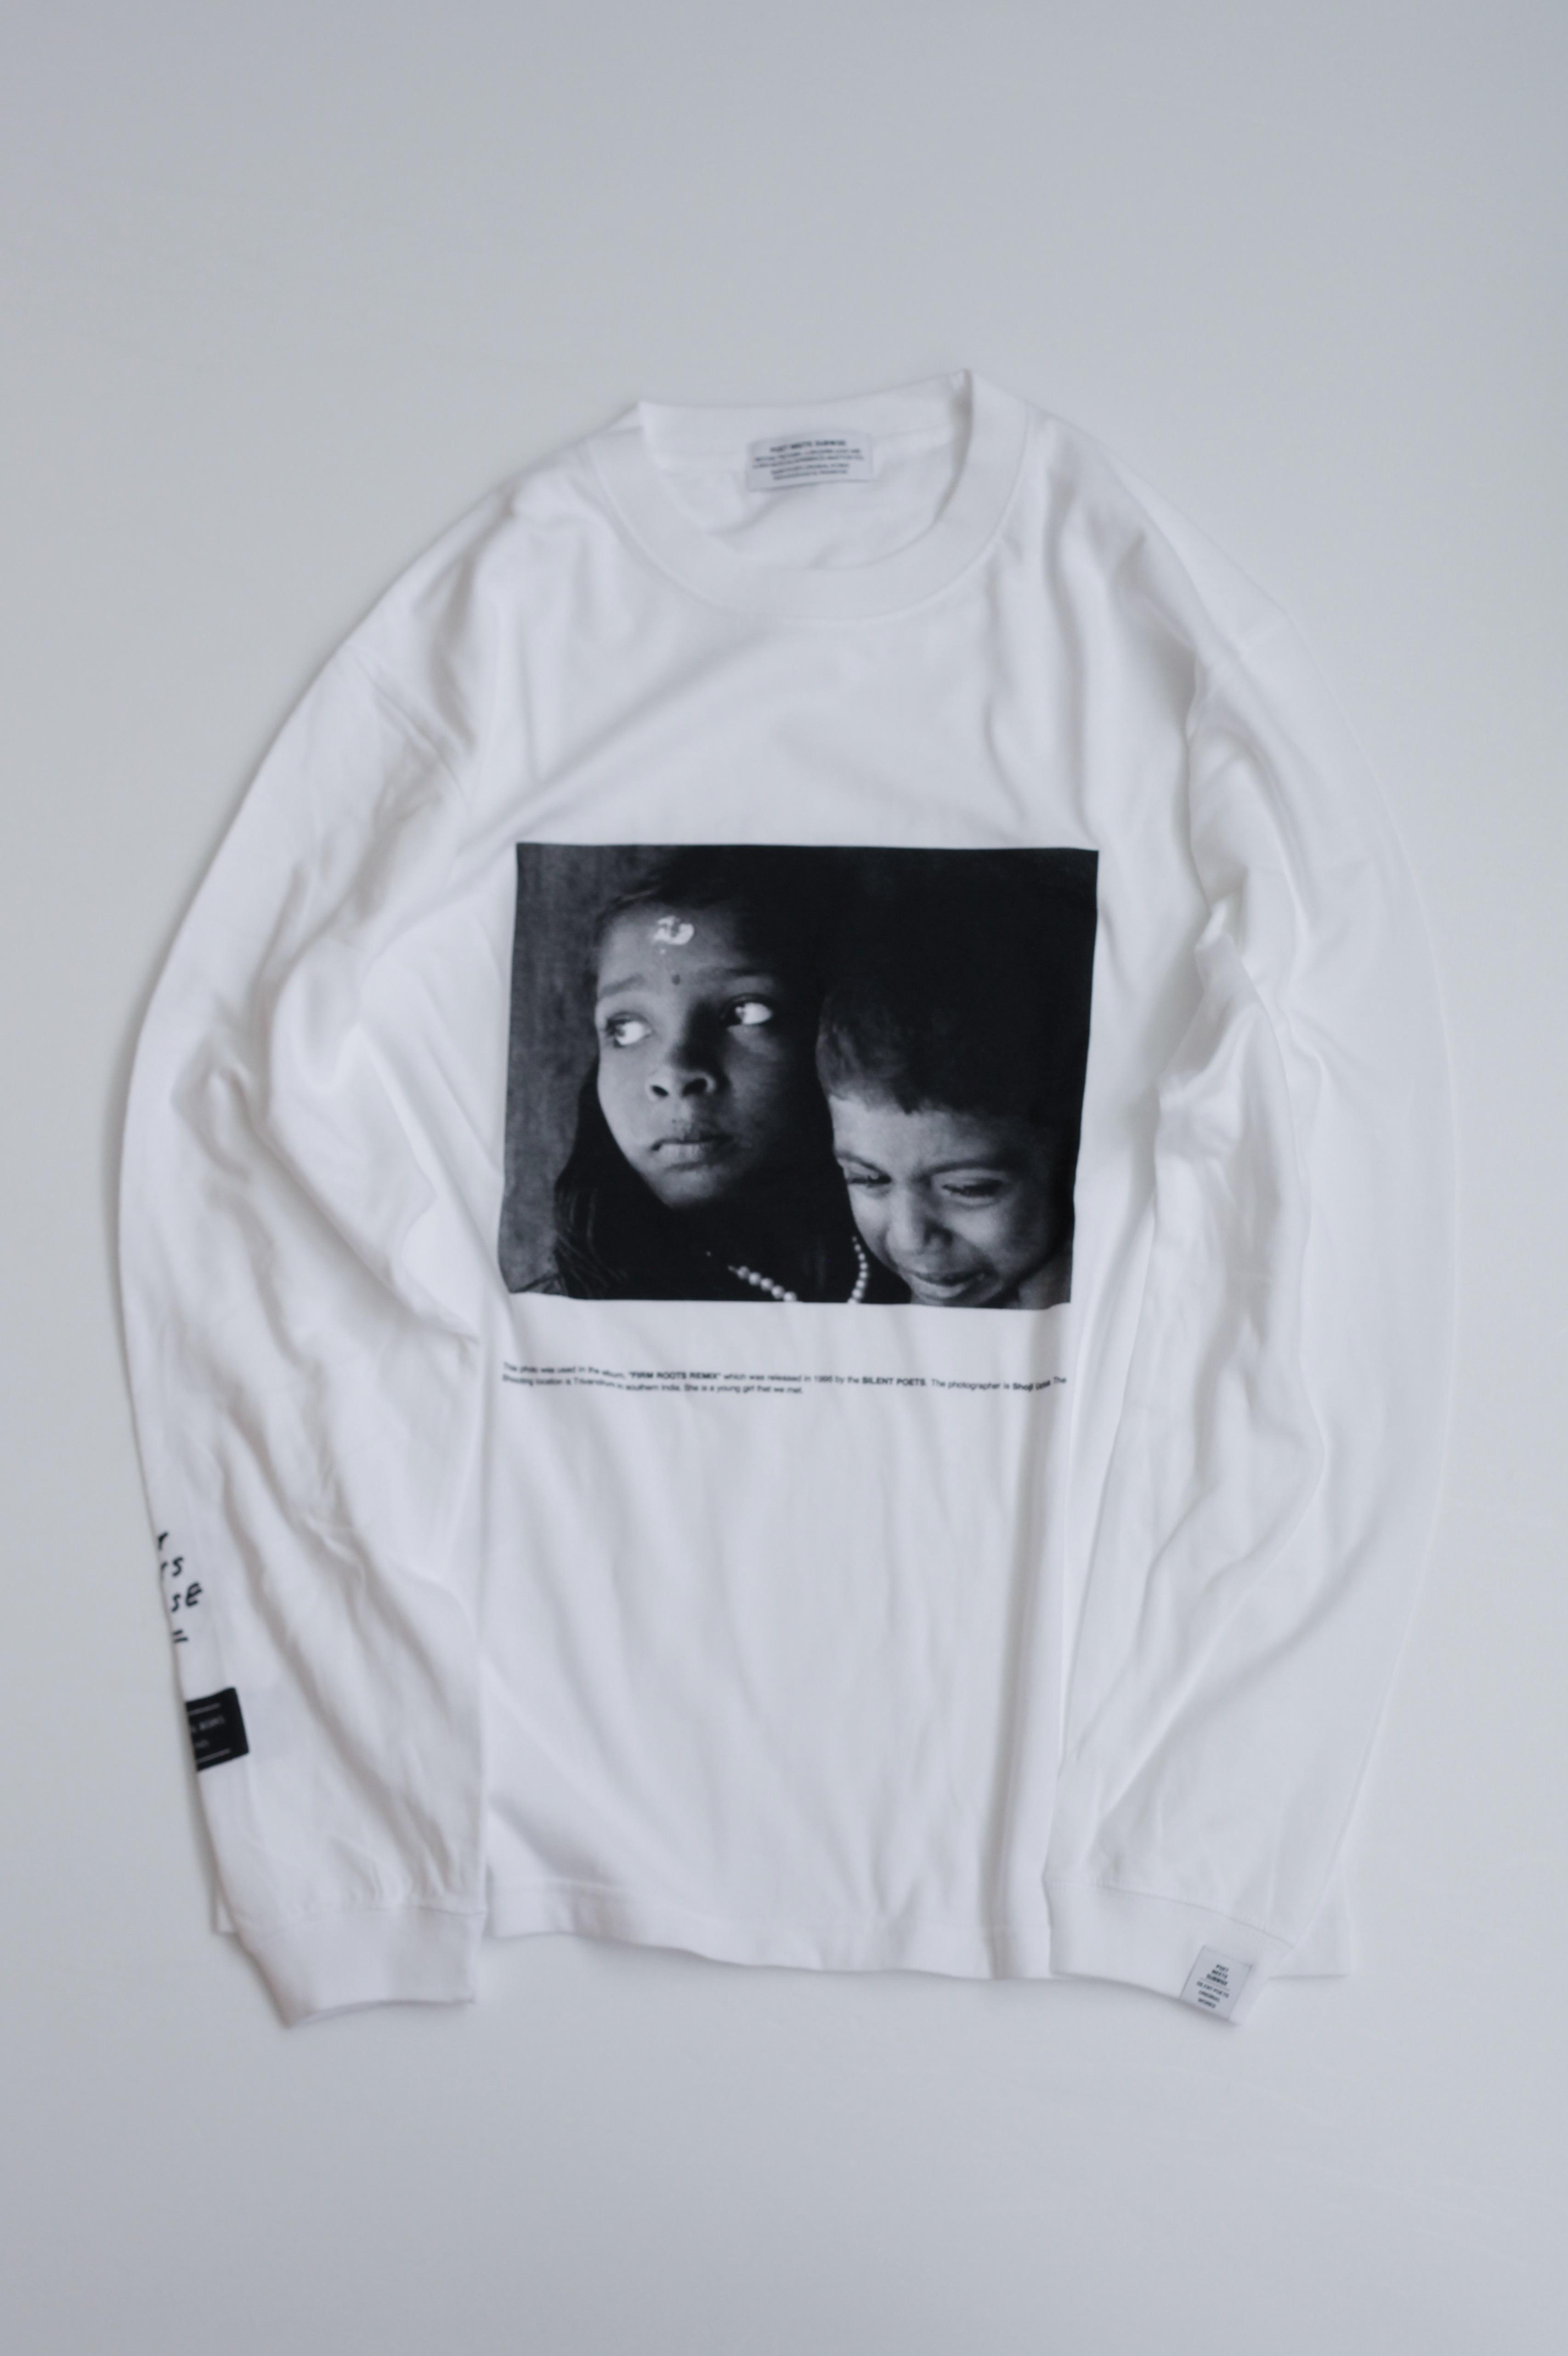 【POET MEETS DUBWISE(ポエトミーツダブワイズ)】 G&B Photo Long Sleeve T-Shirt